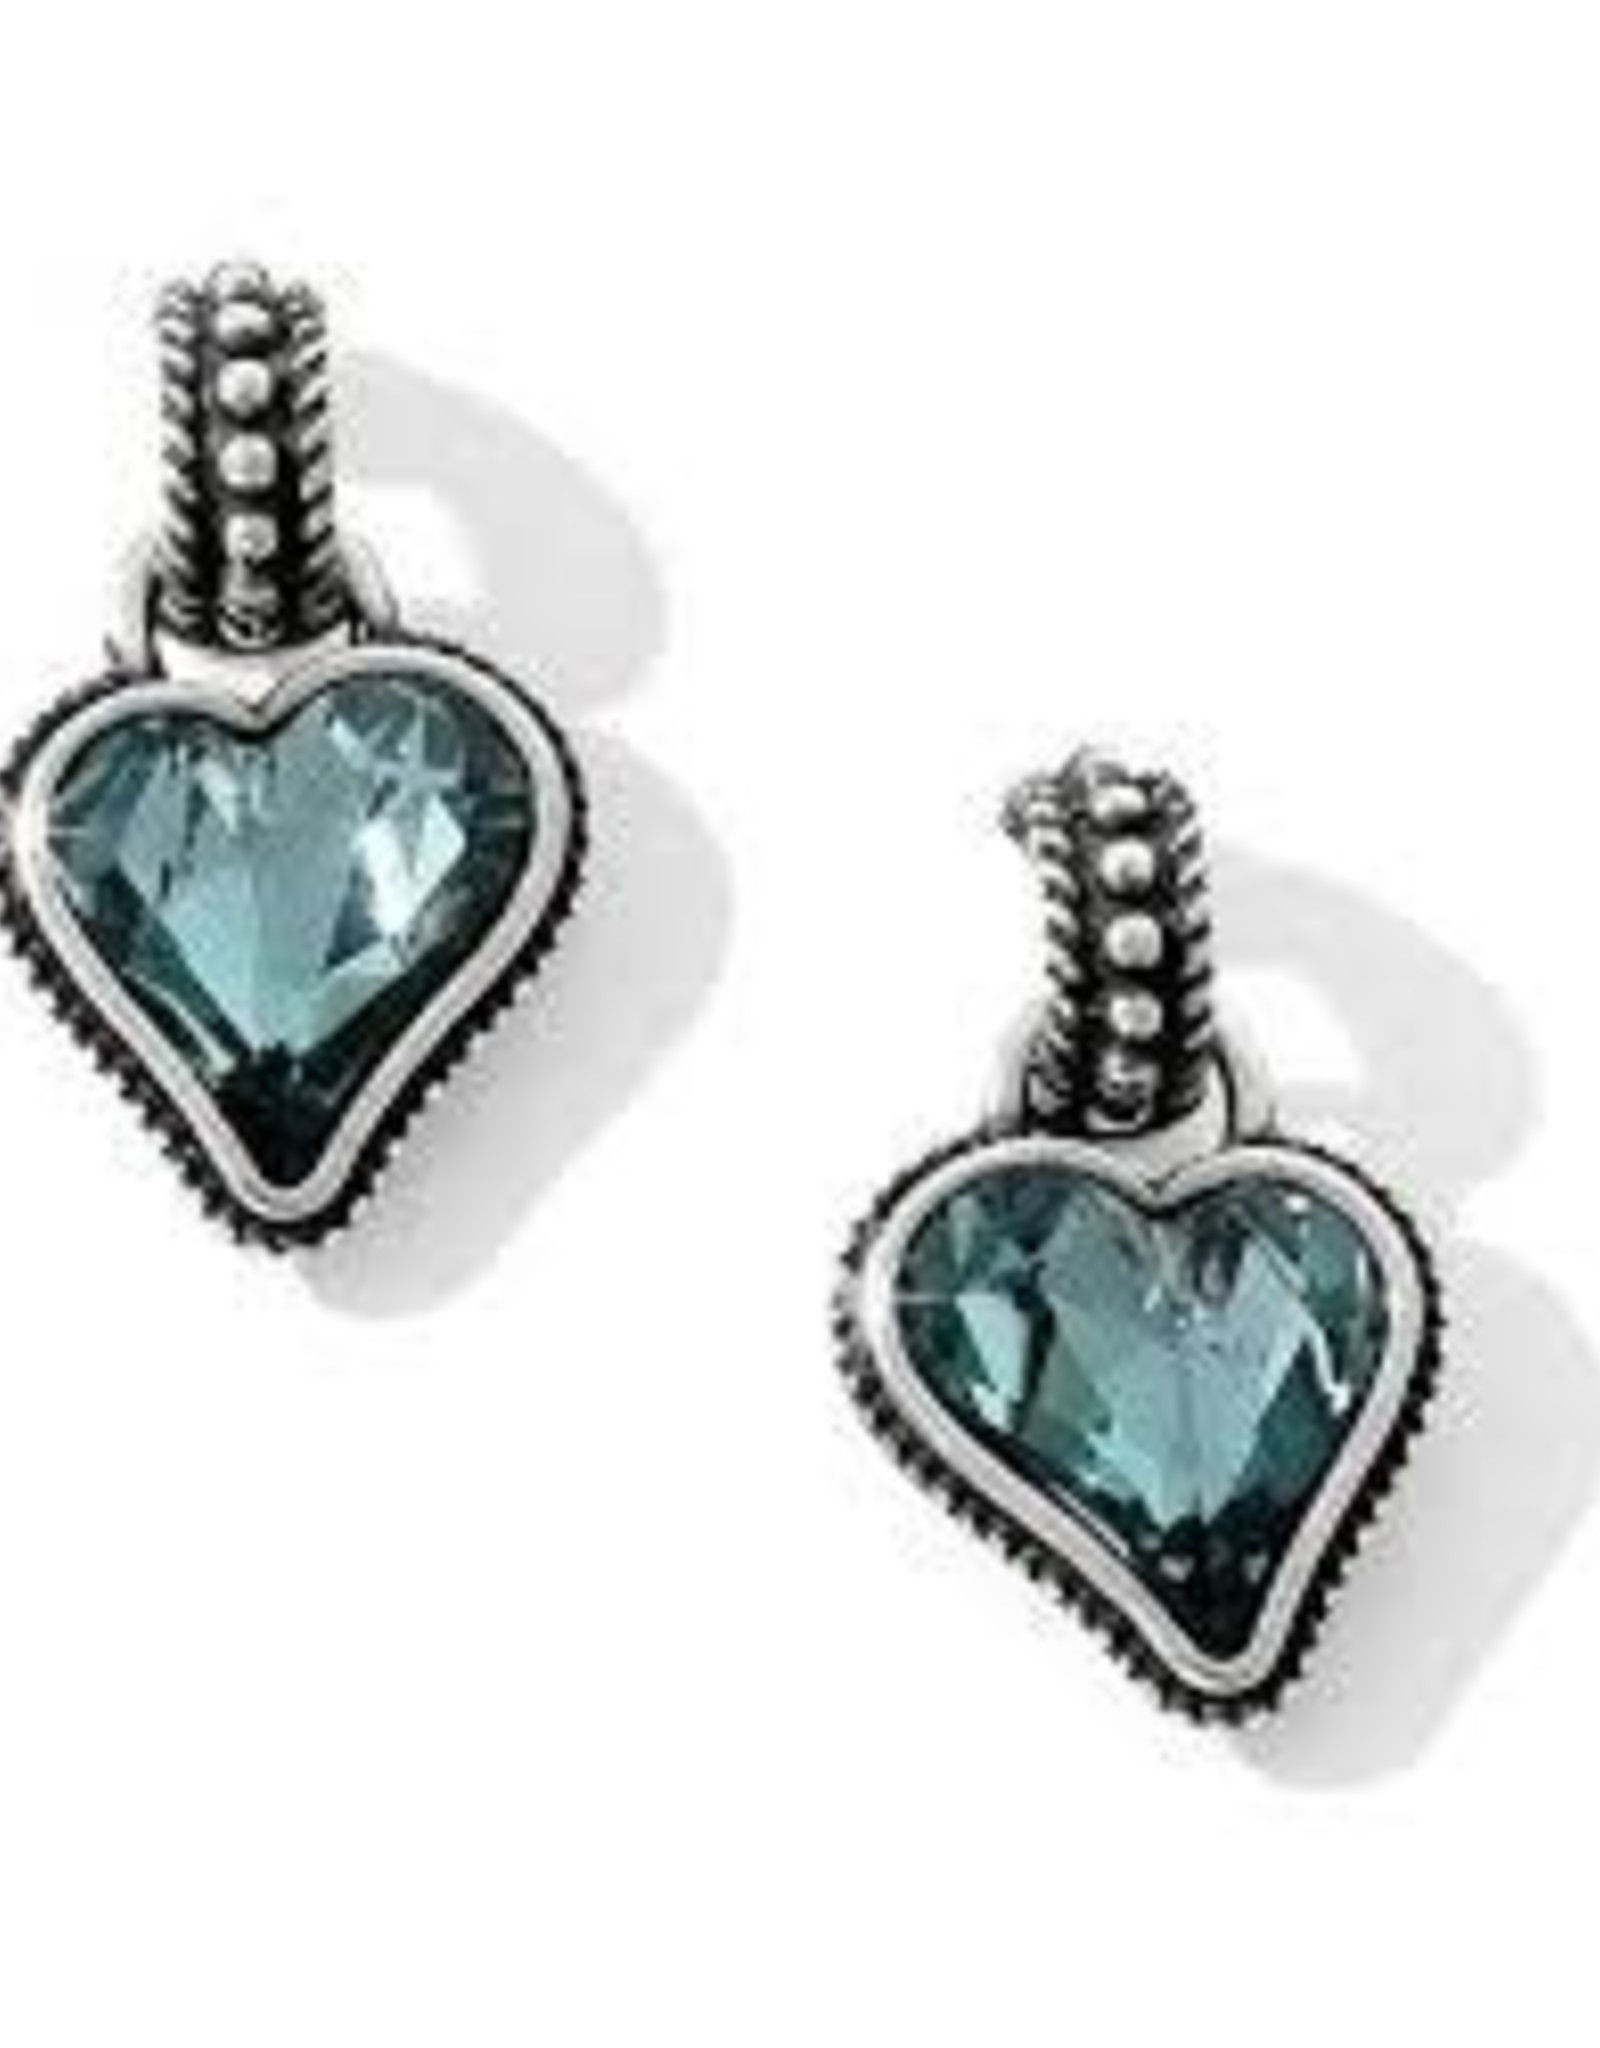 Brighton Brighton, Blue Bibi Heart Reversible Earrings